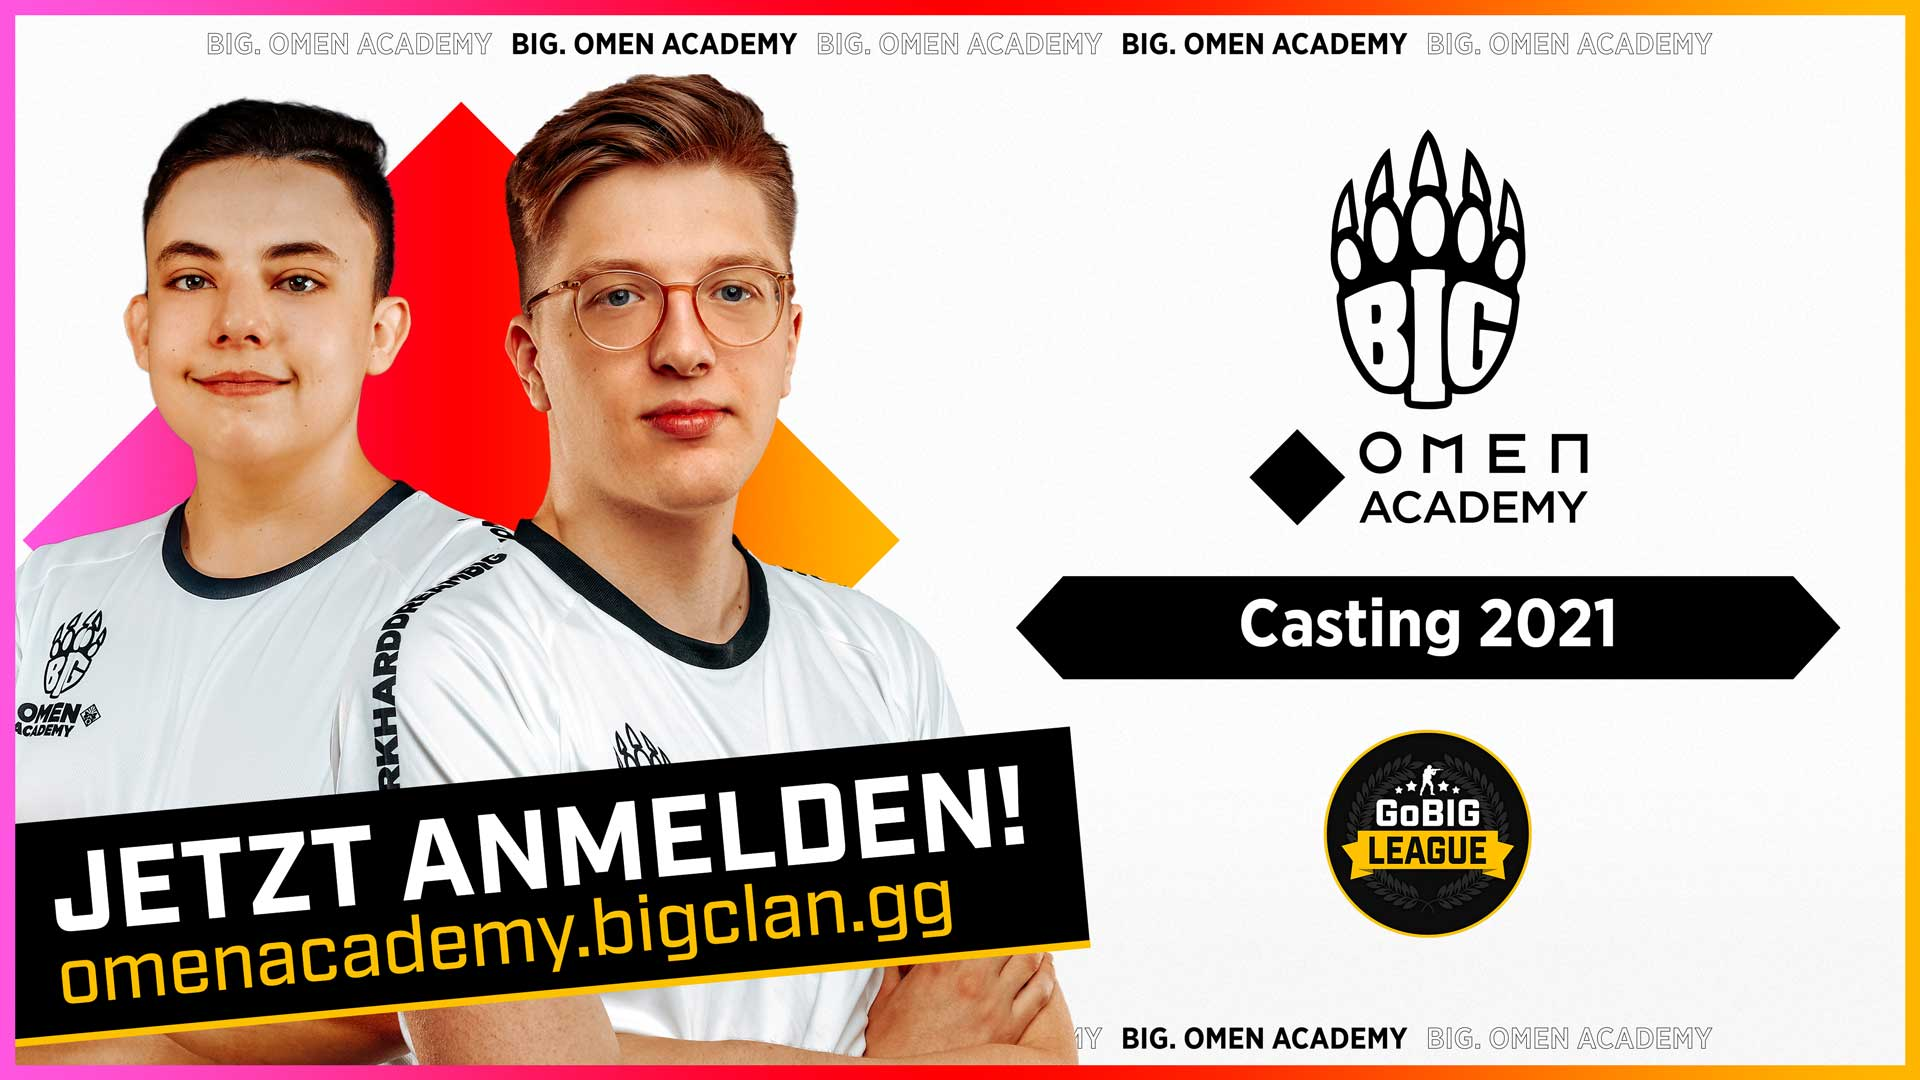 Thumbnail OMEN Academy News babt